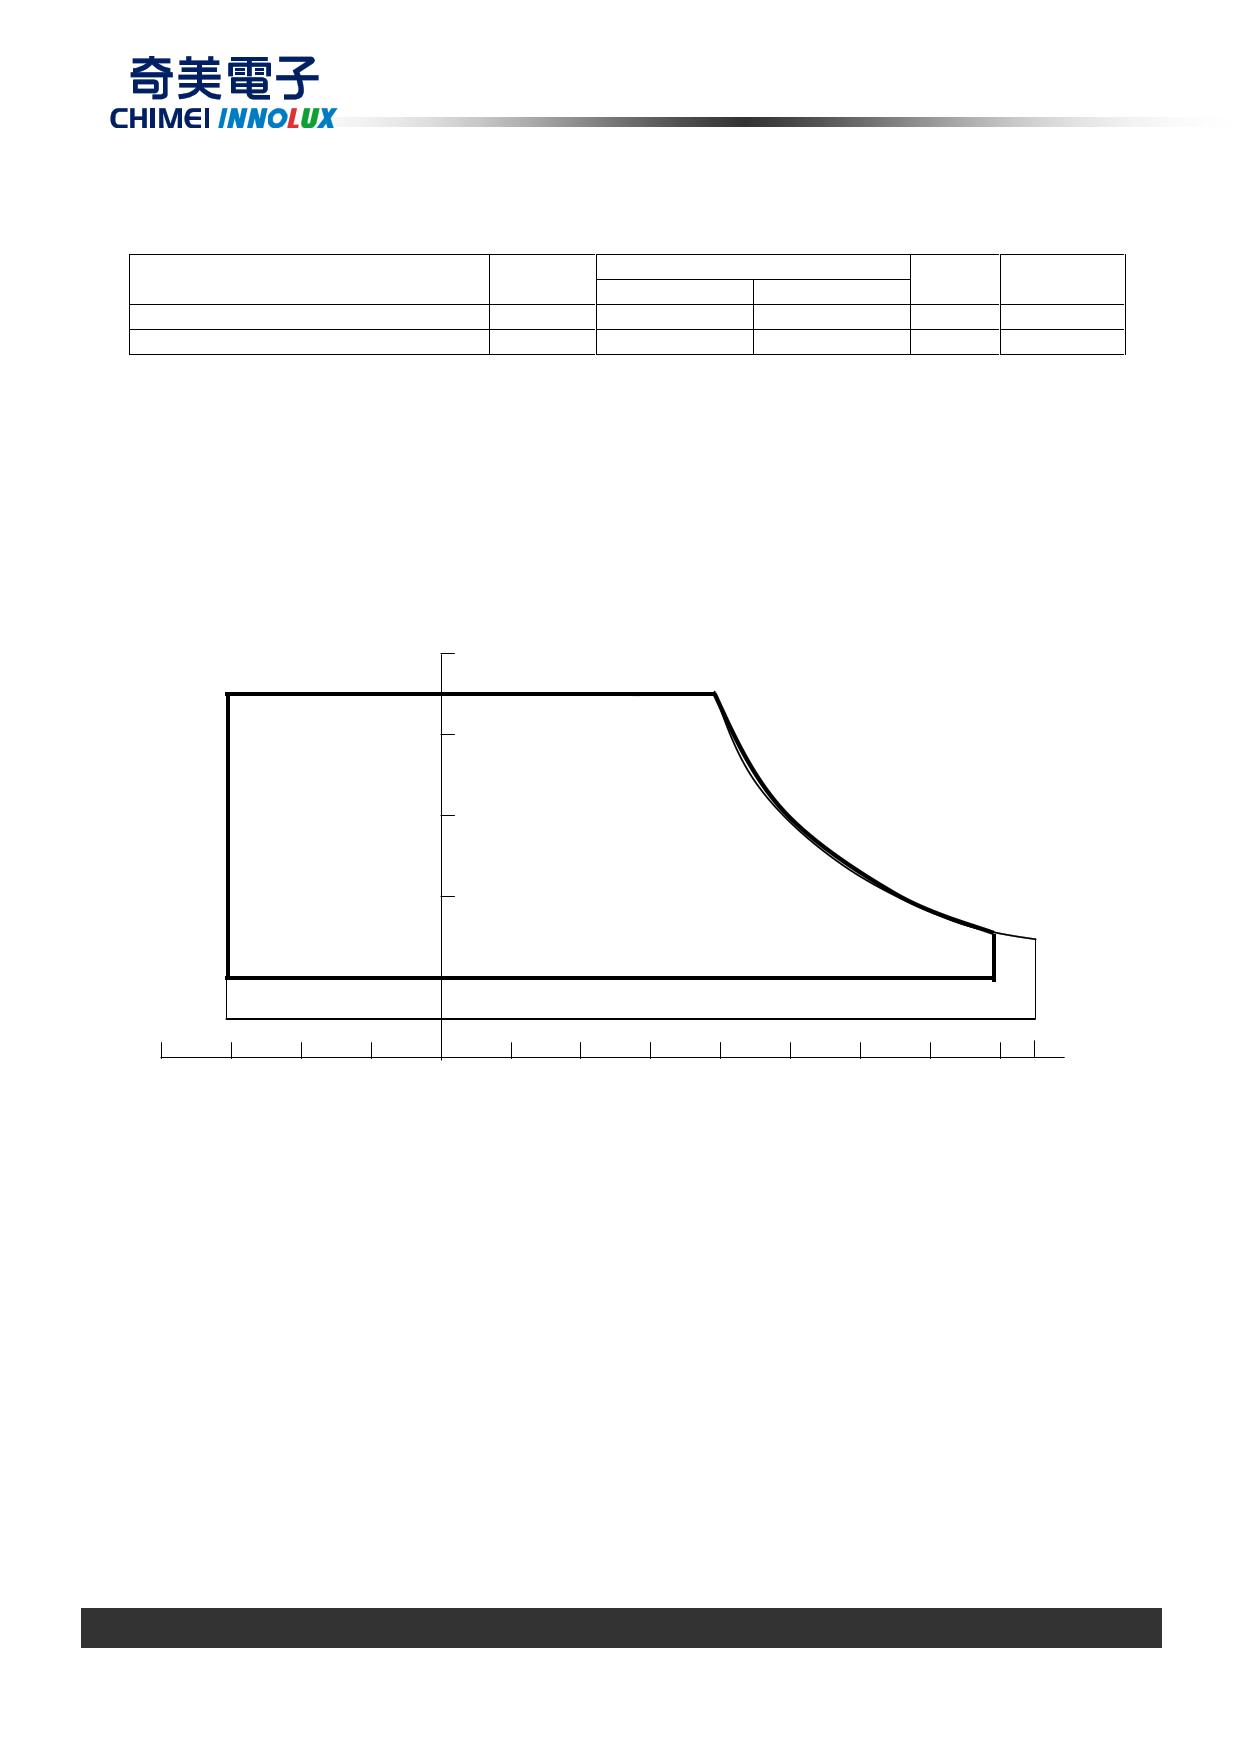 G104AGE-L02 電子部品, 半導体